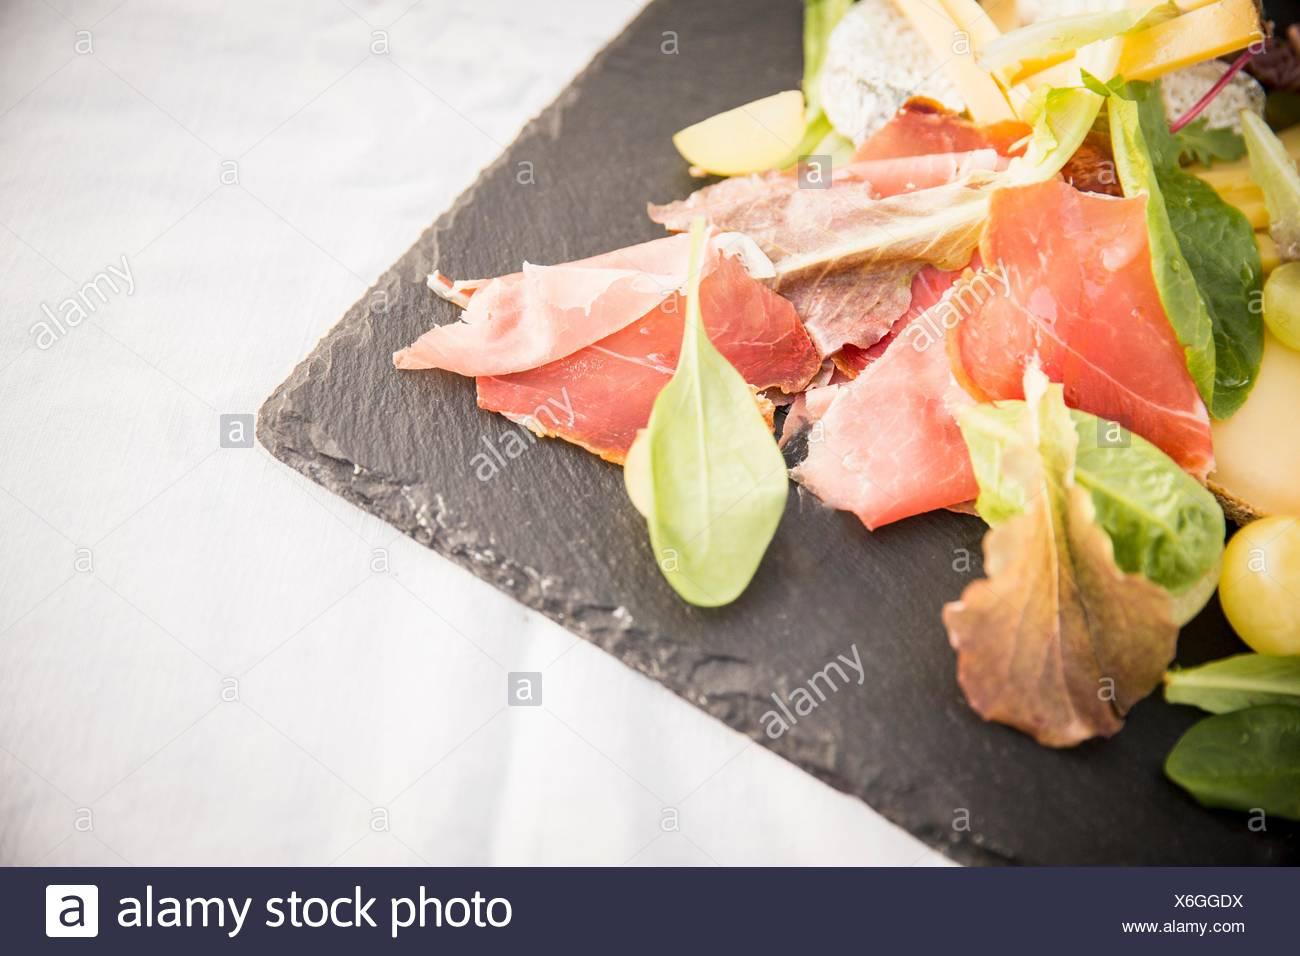 Ham and salad leaves on slate, close-up - Stock Image